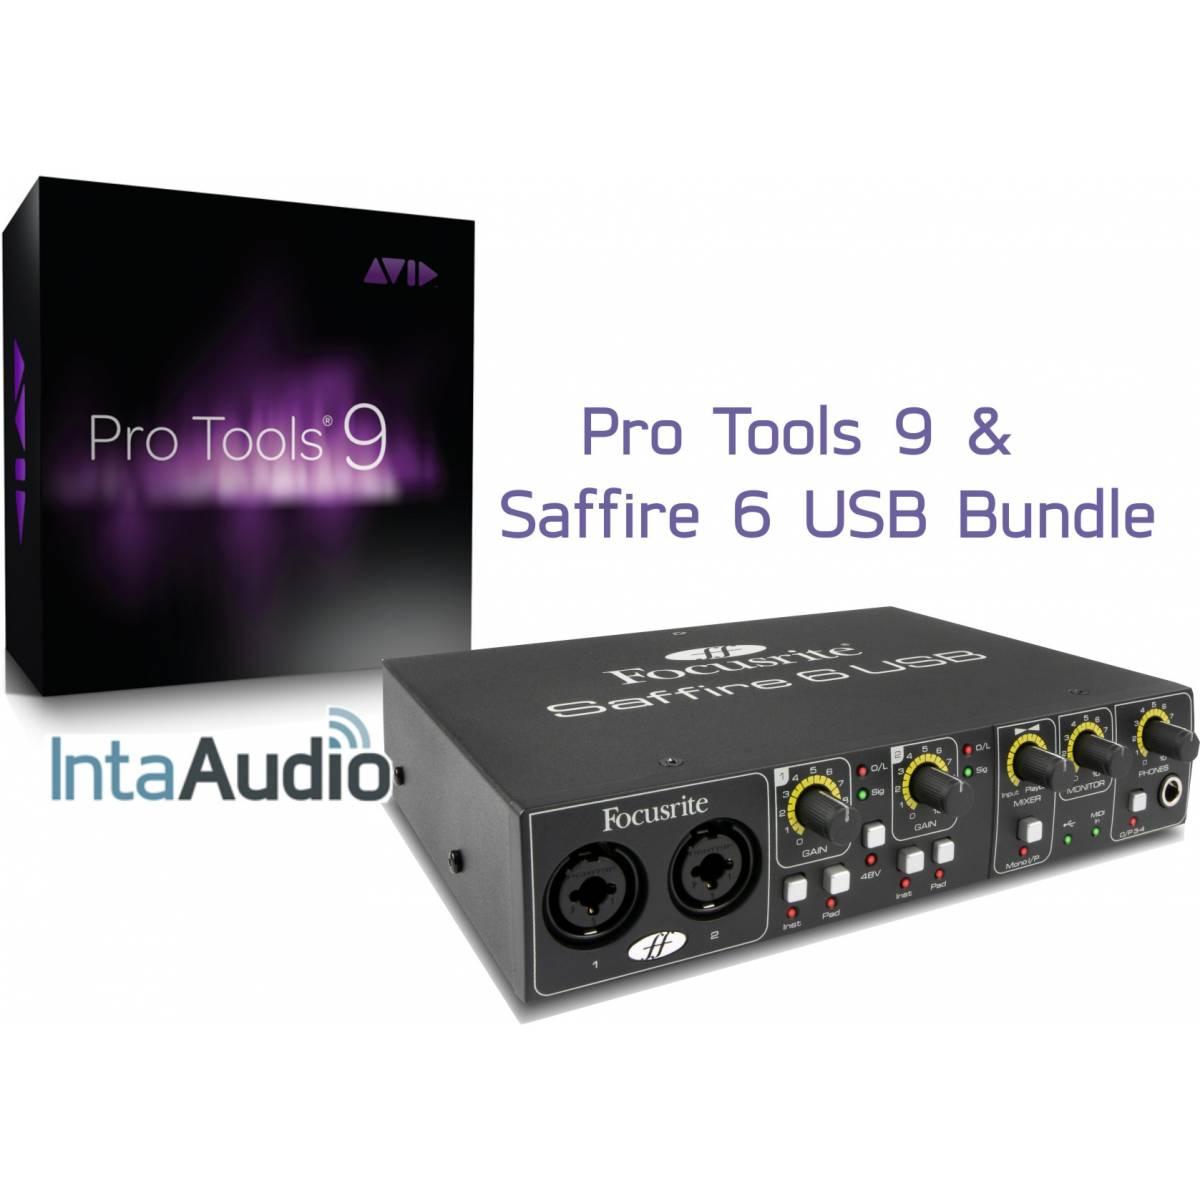 pro tools 9 focusrite saffire 6 bundle pro tools interfaces from inta audio uk. Black Bedroom Furniture Sets. Home Design Ideas